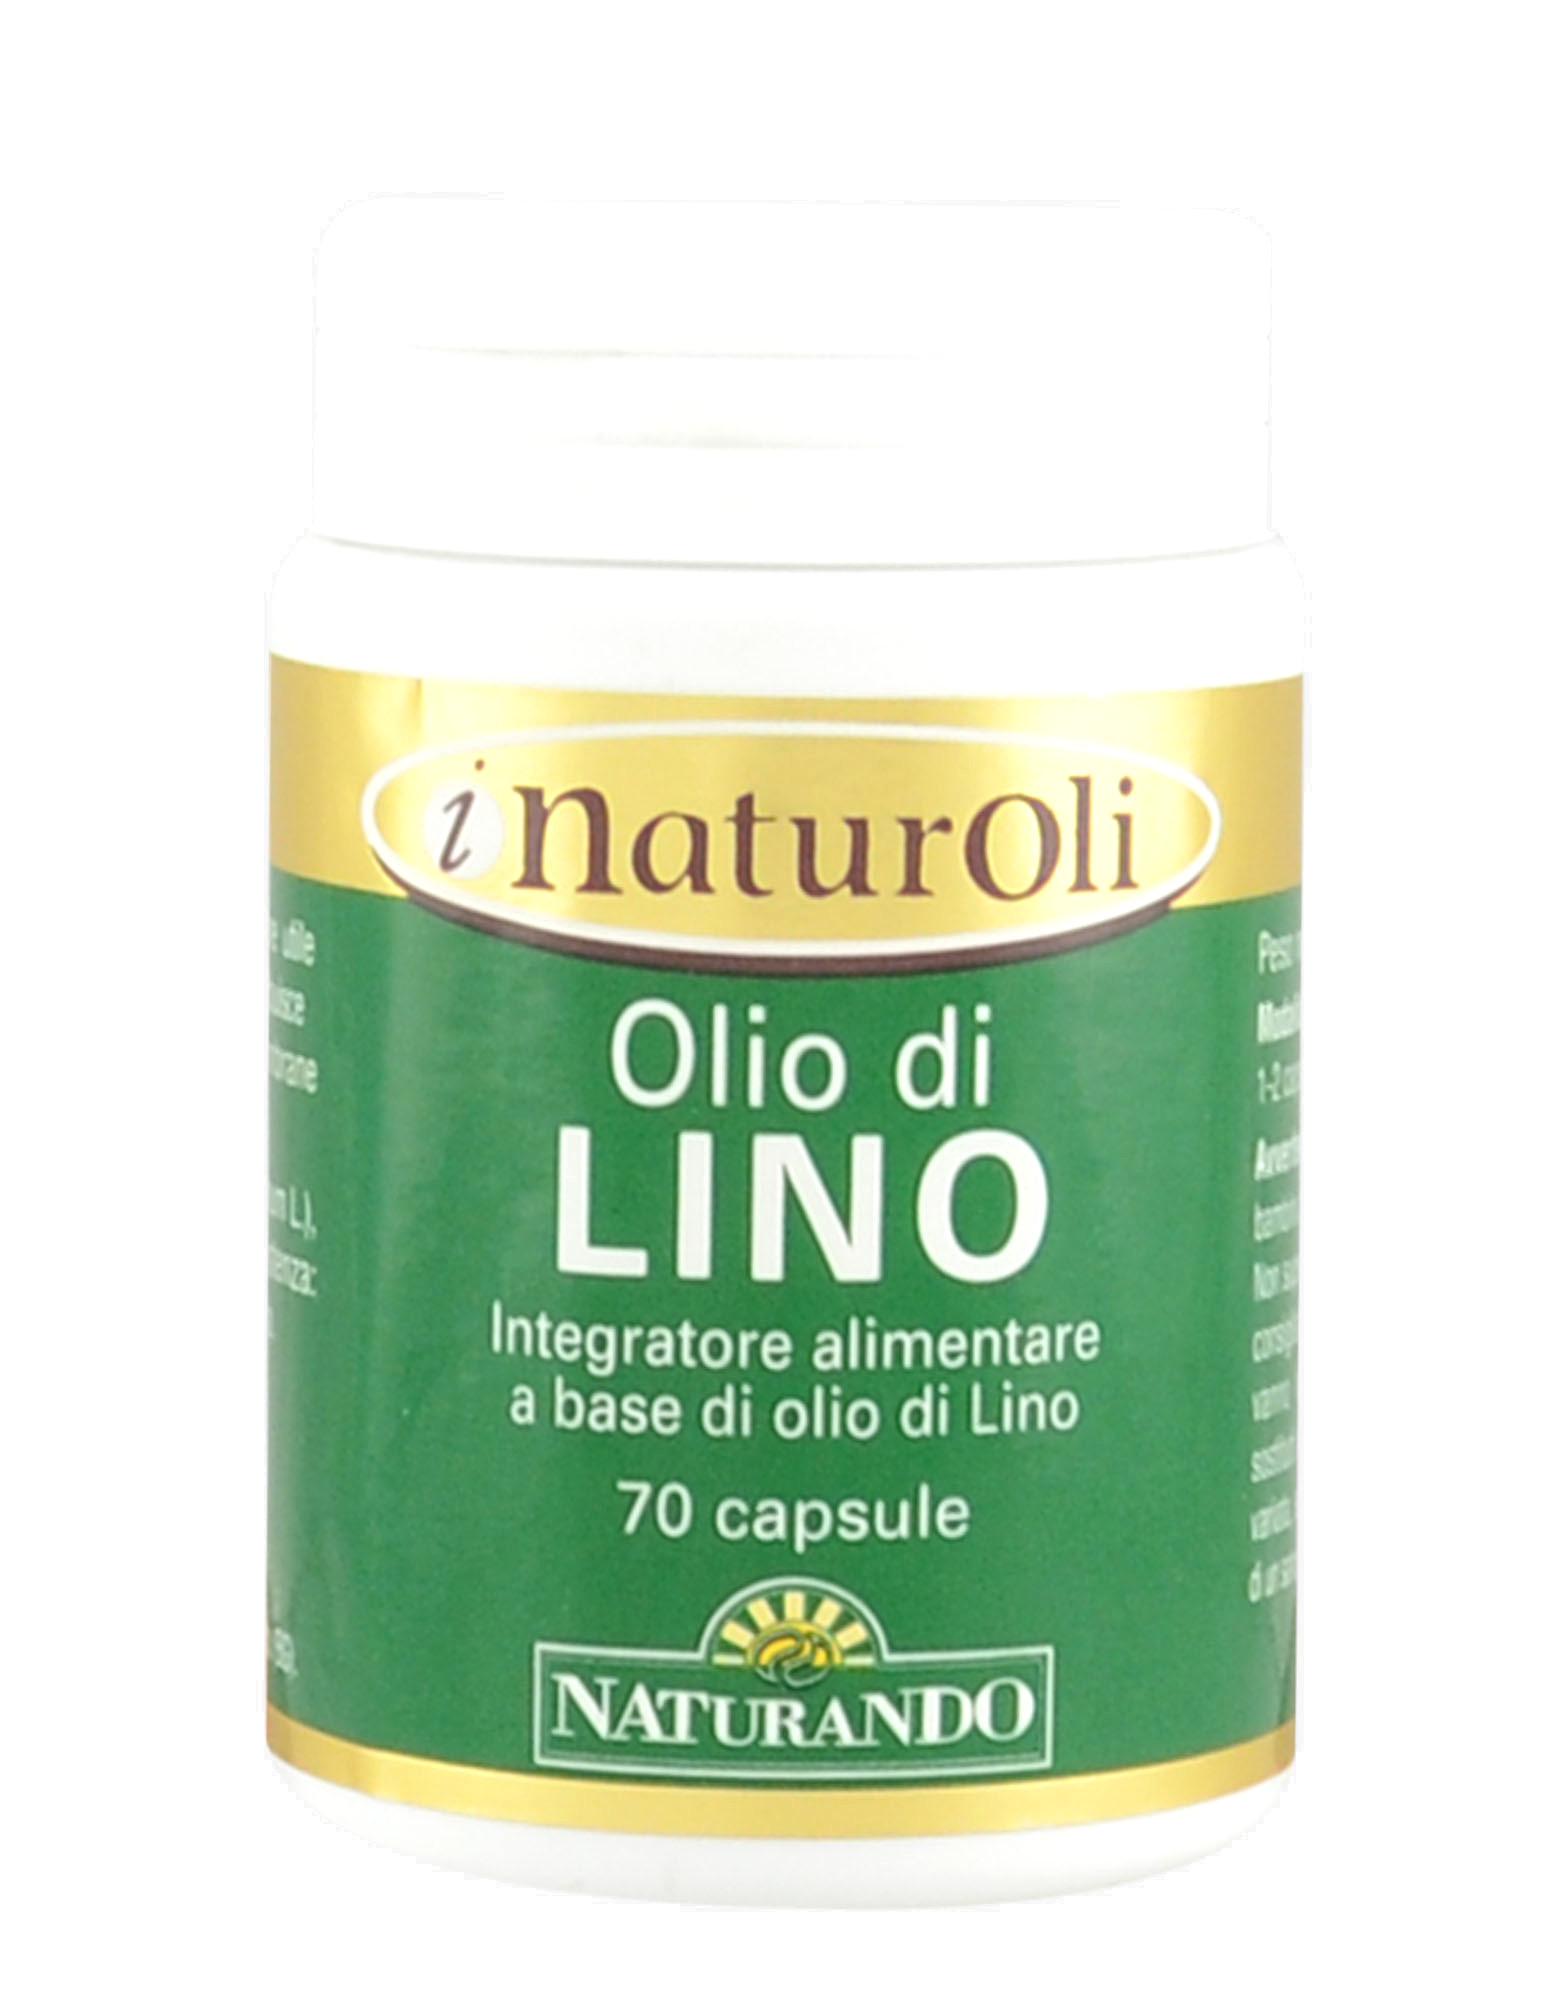 I NaturOli - Olio di Lino 70 capsule